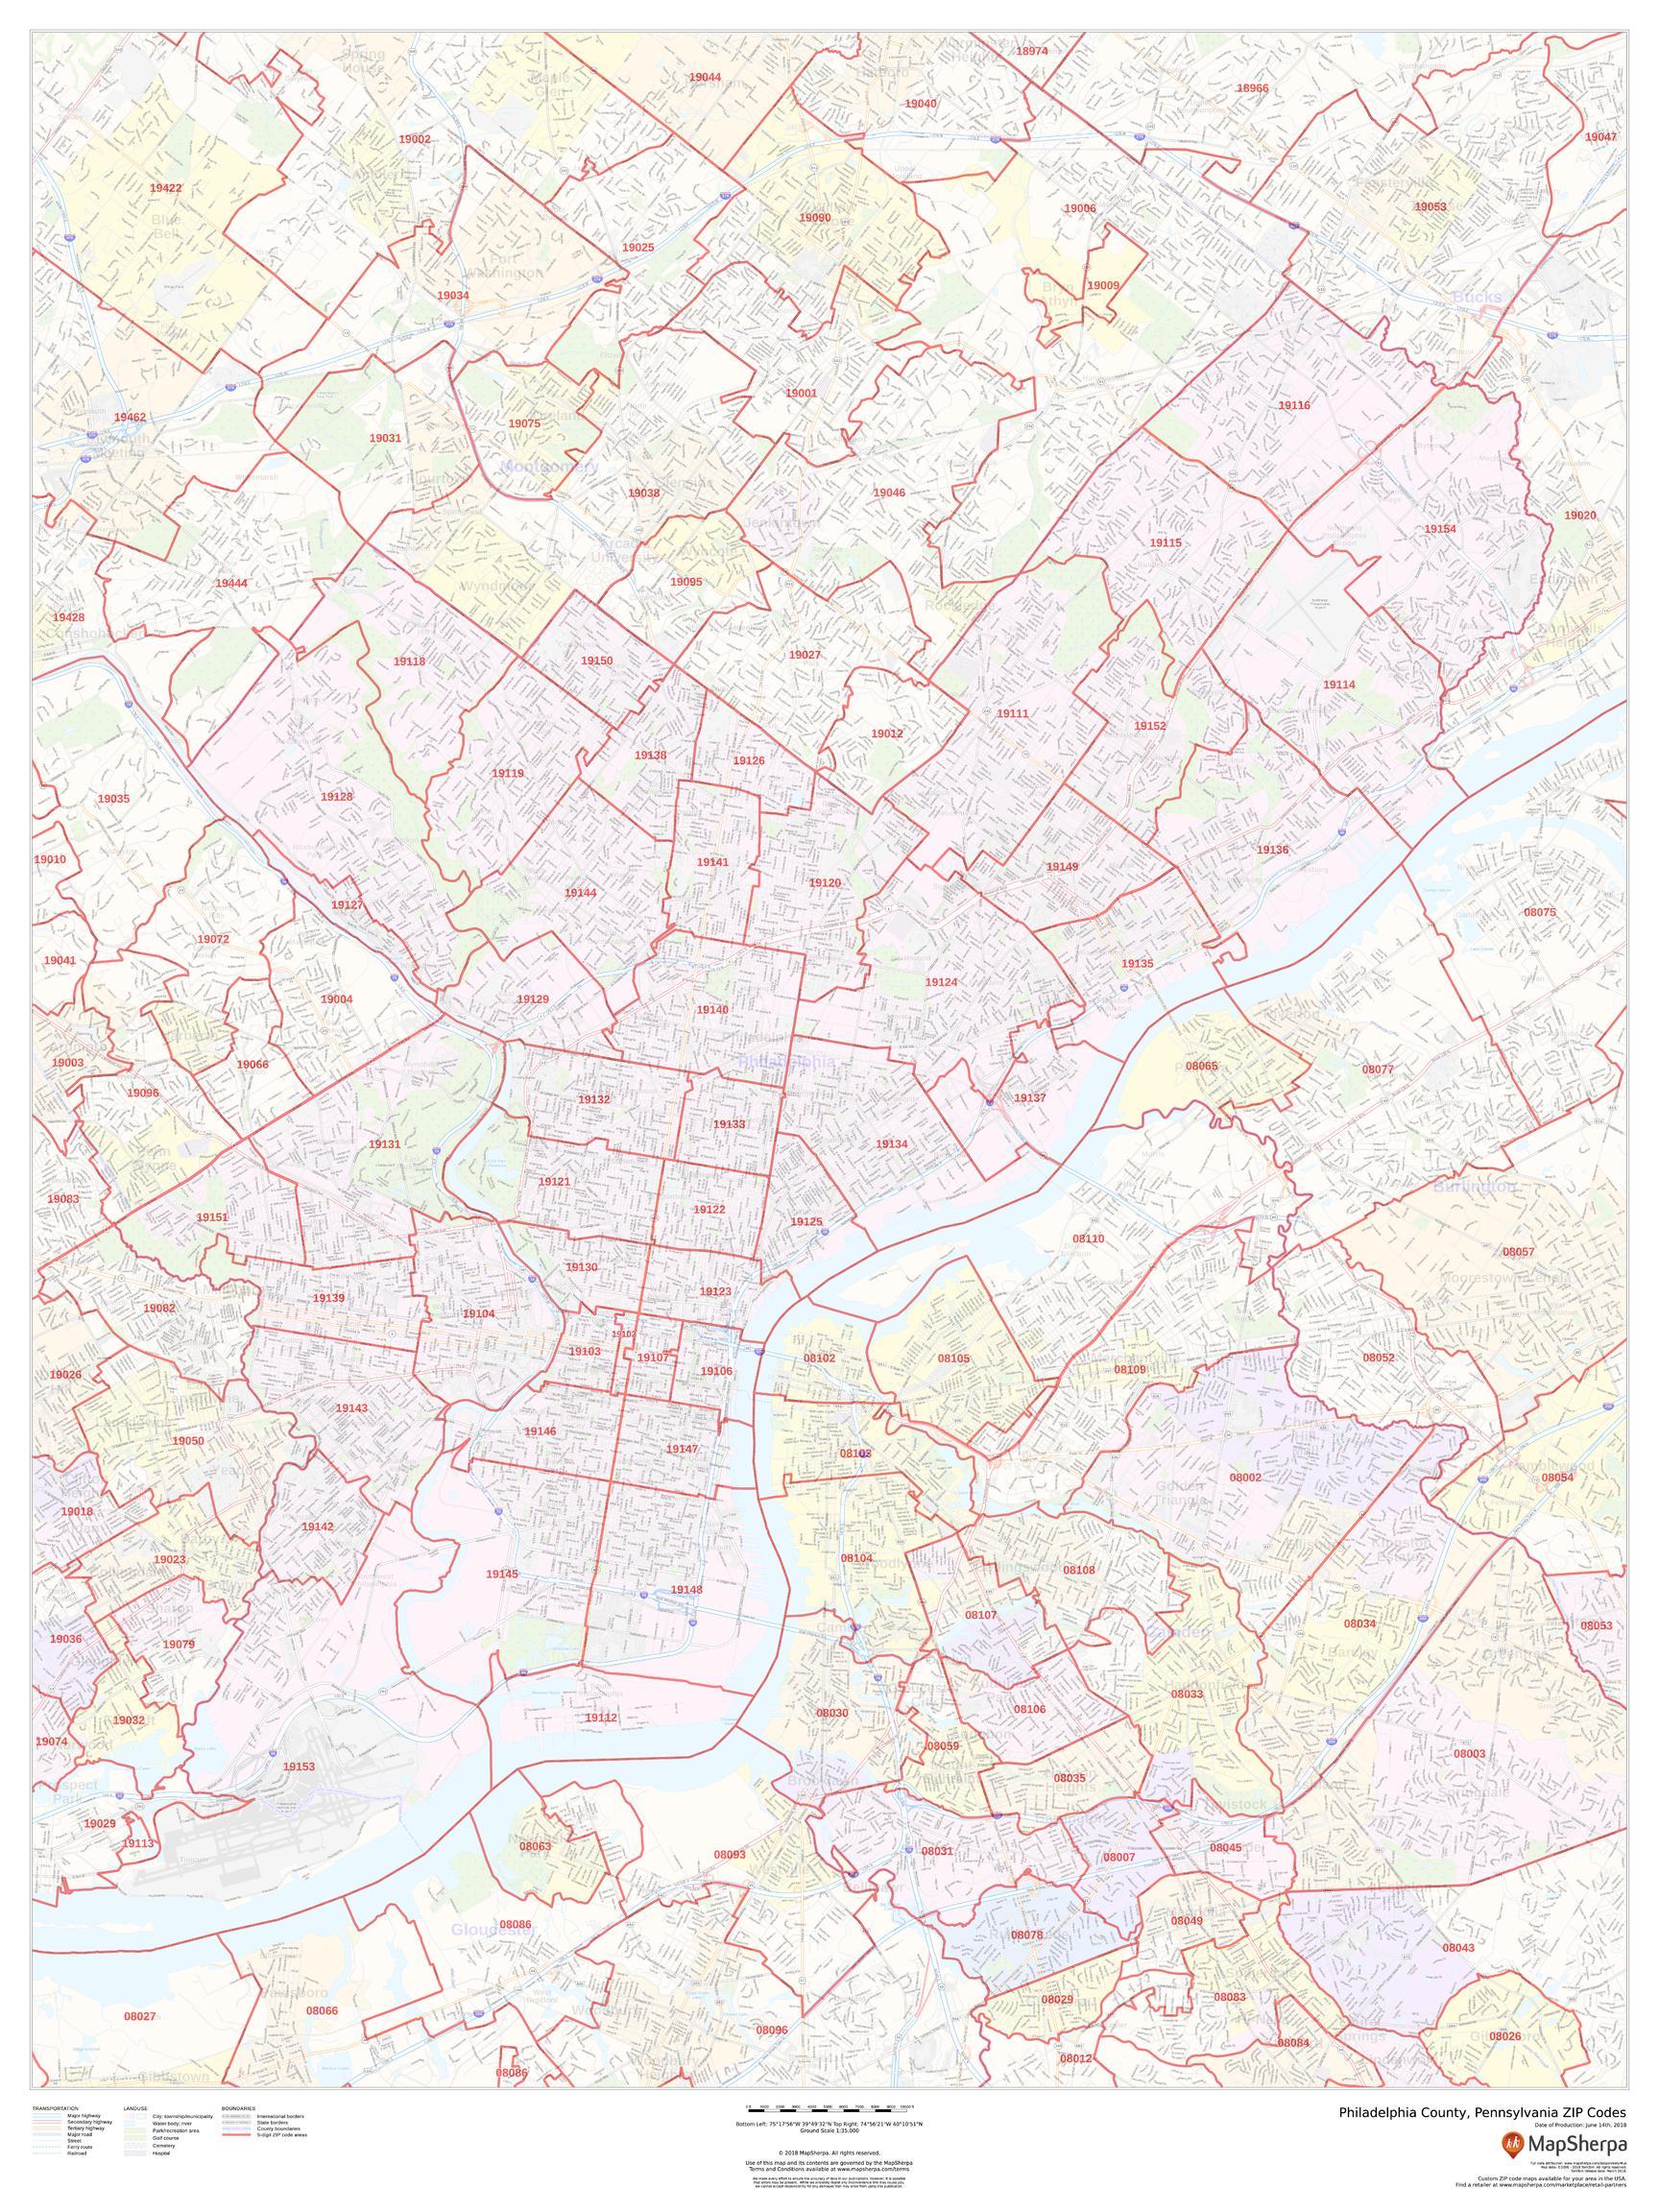 Montgomery County Pa Zip Code Map : montgomery, county, Philadelphia, County, Pennsylvania, Codes